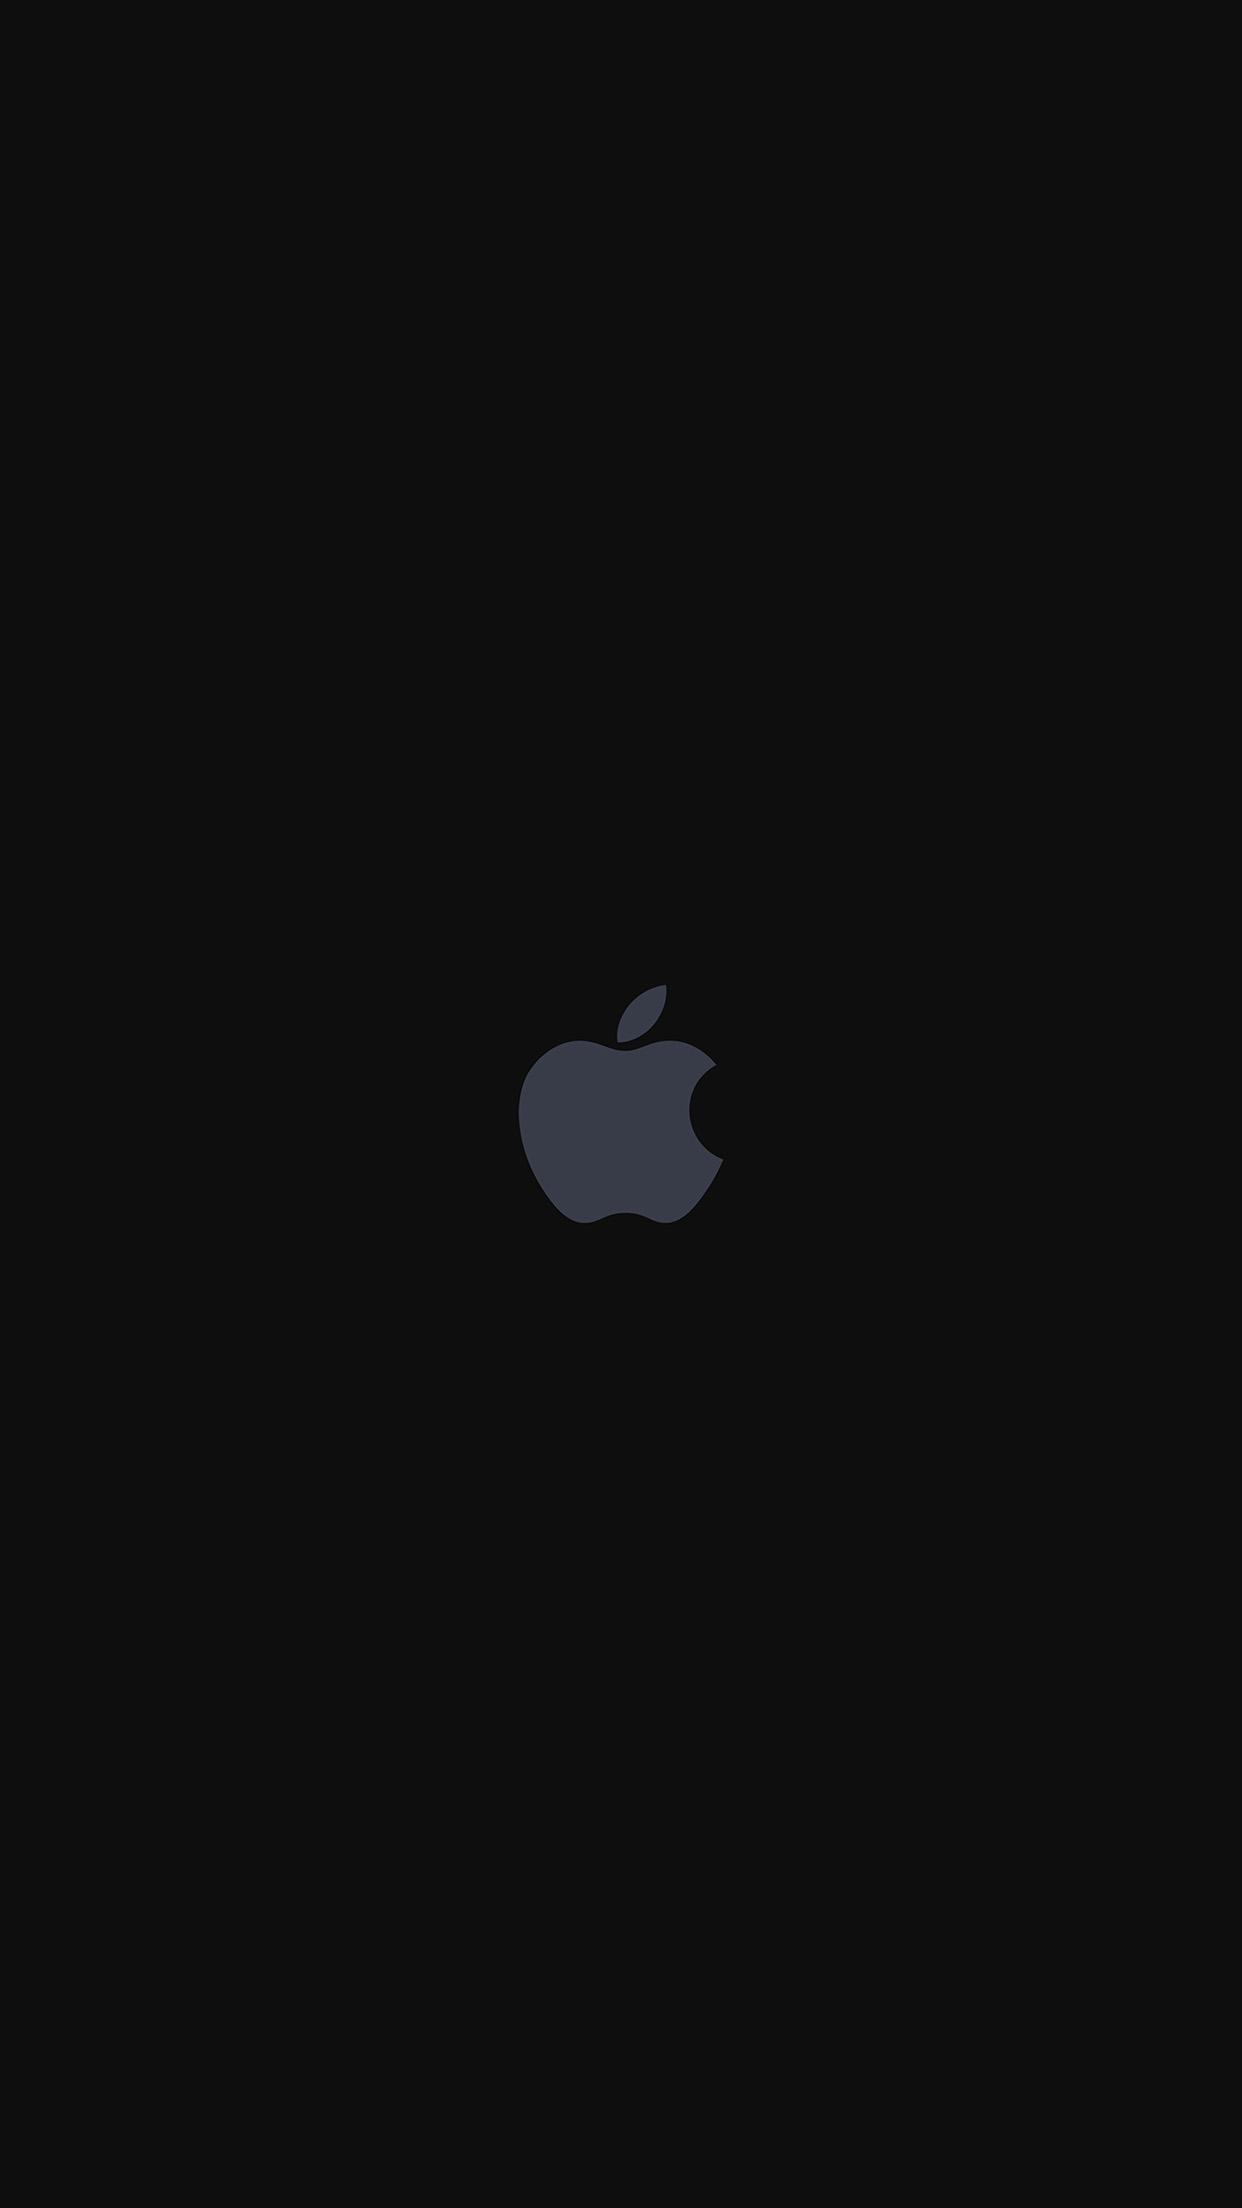 Iphone7 Apple Logo Dark Art Illustration Android Wallpaper